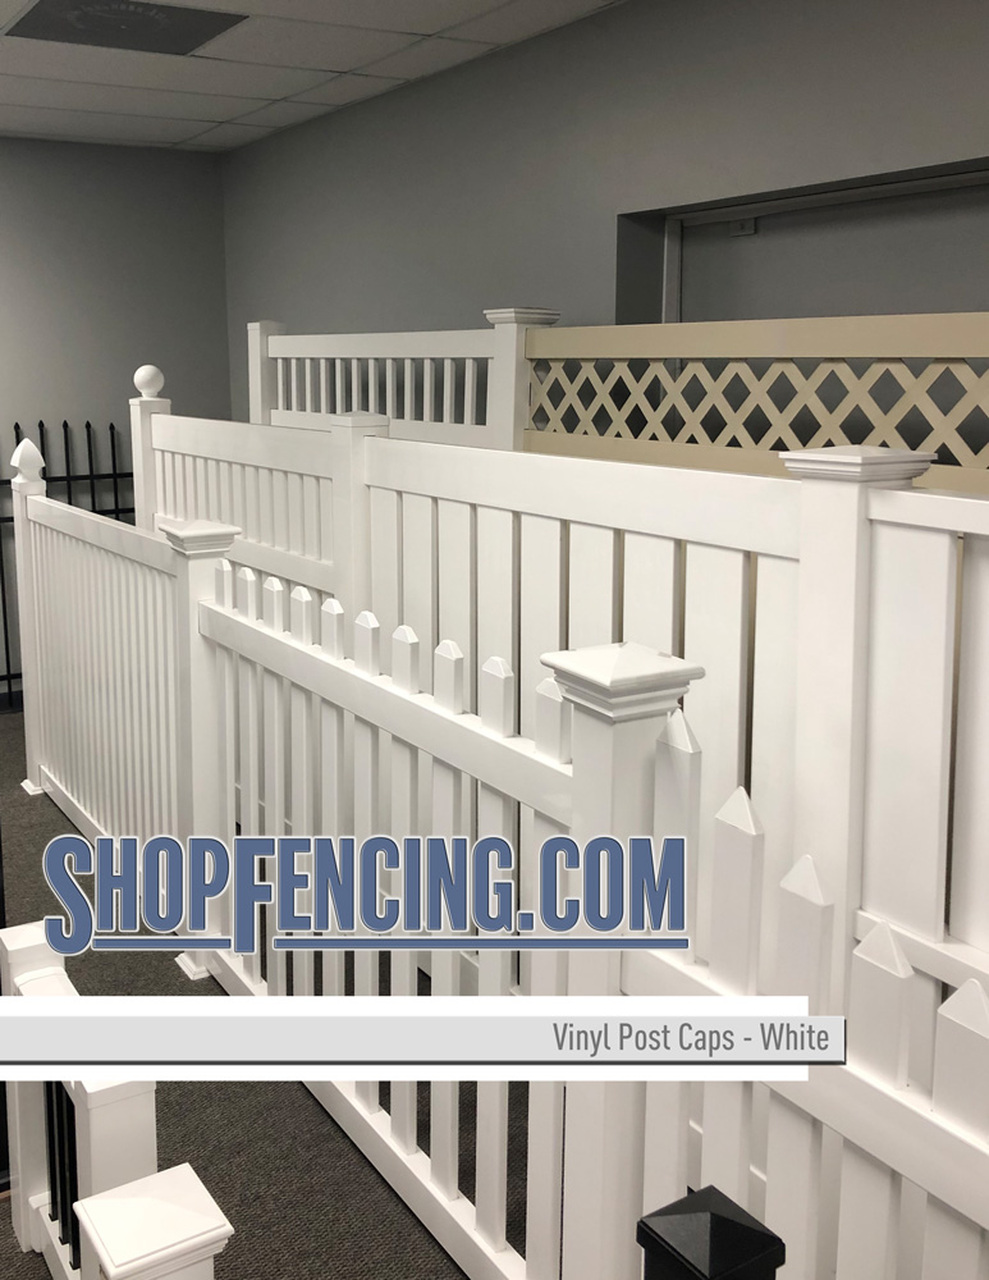 Vinyl Ranch Rail Fence Posts & Caps From ShopFencing.com